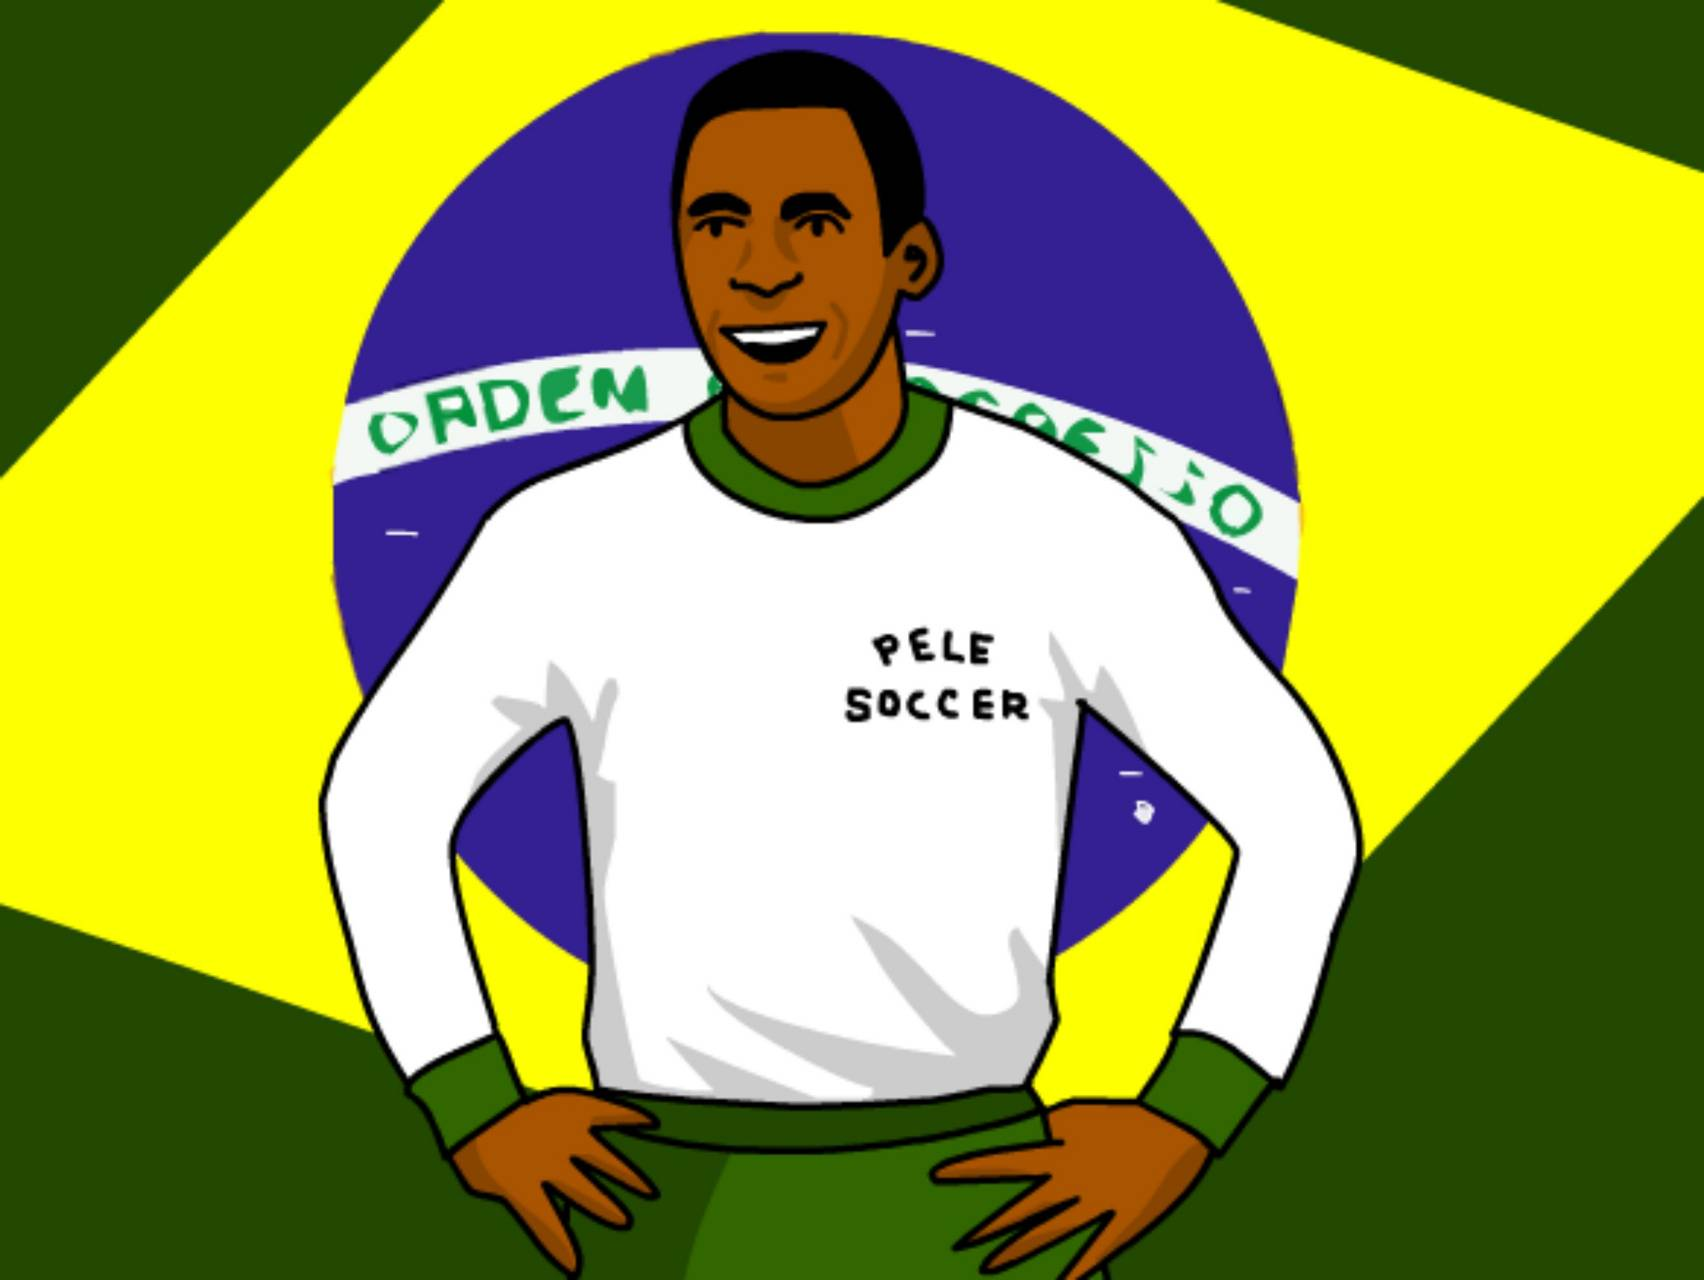 Pele Mean Soccer